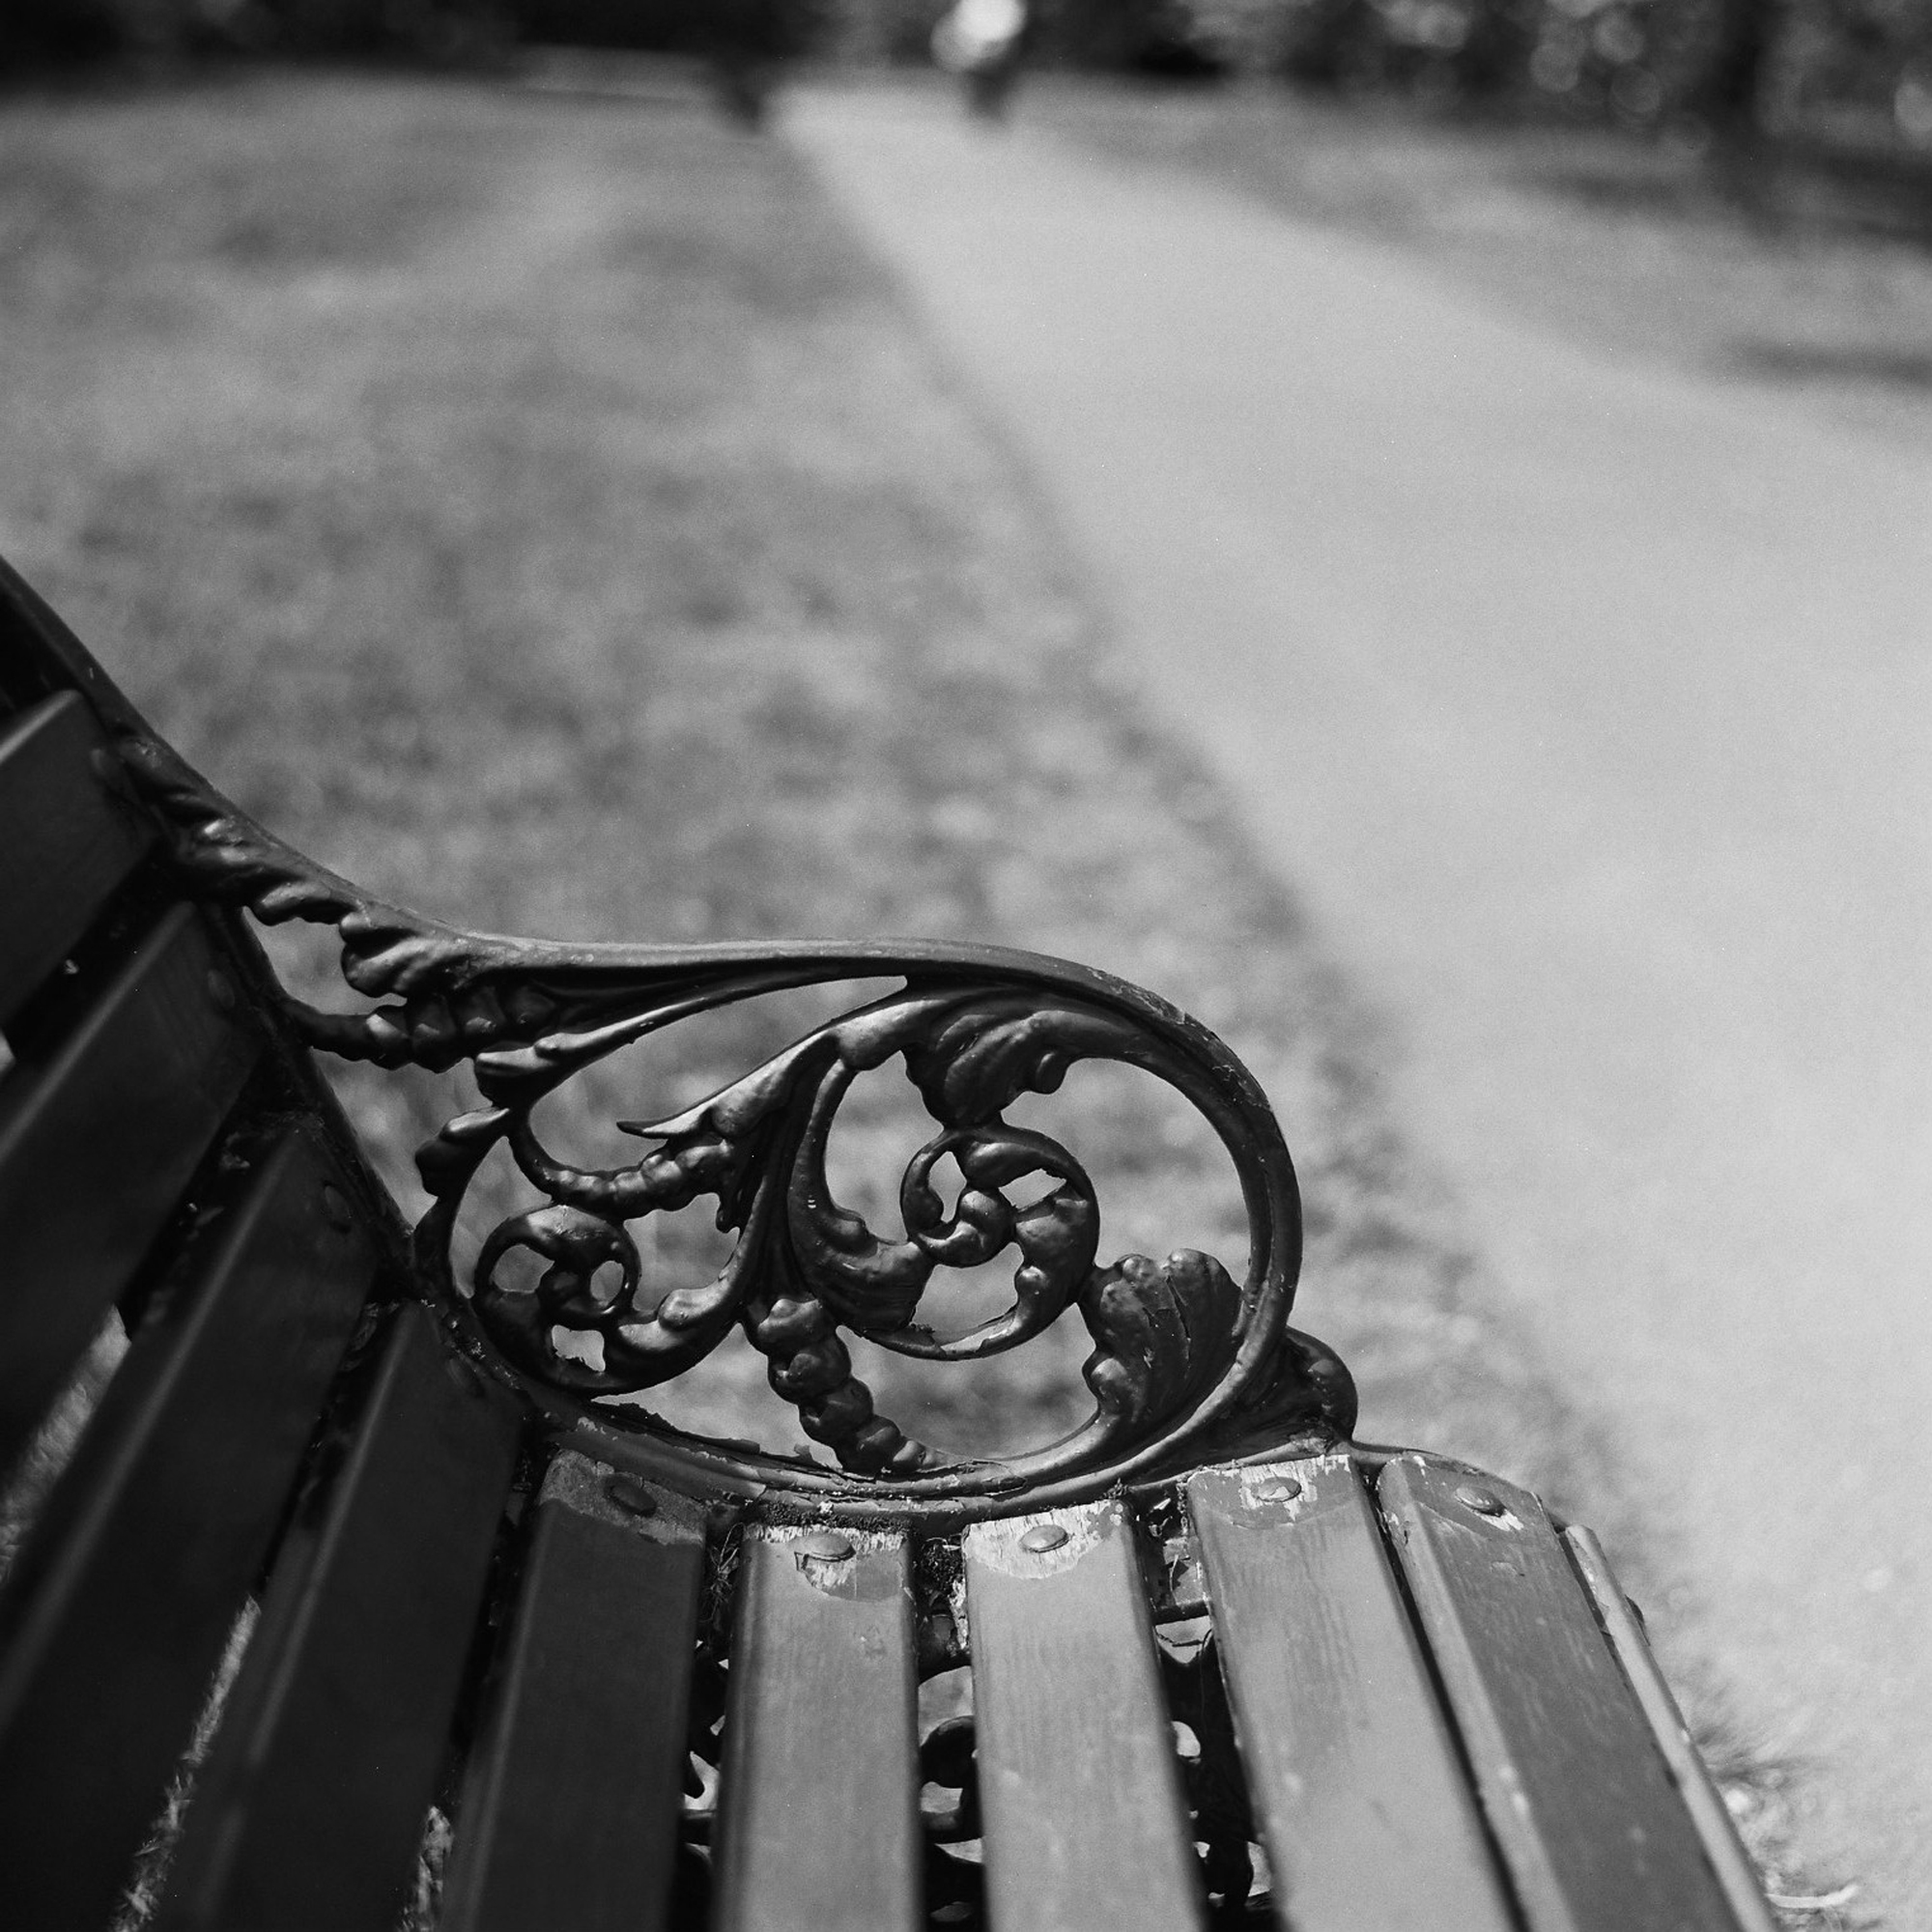 Bench detail (Pic: Stephen Dowling)